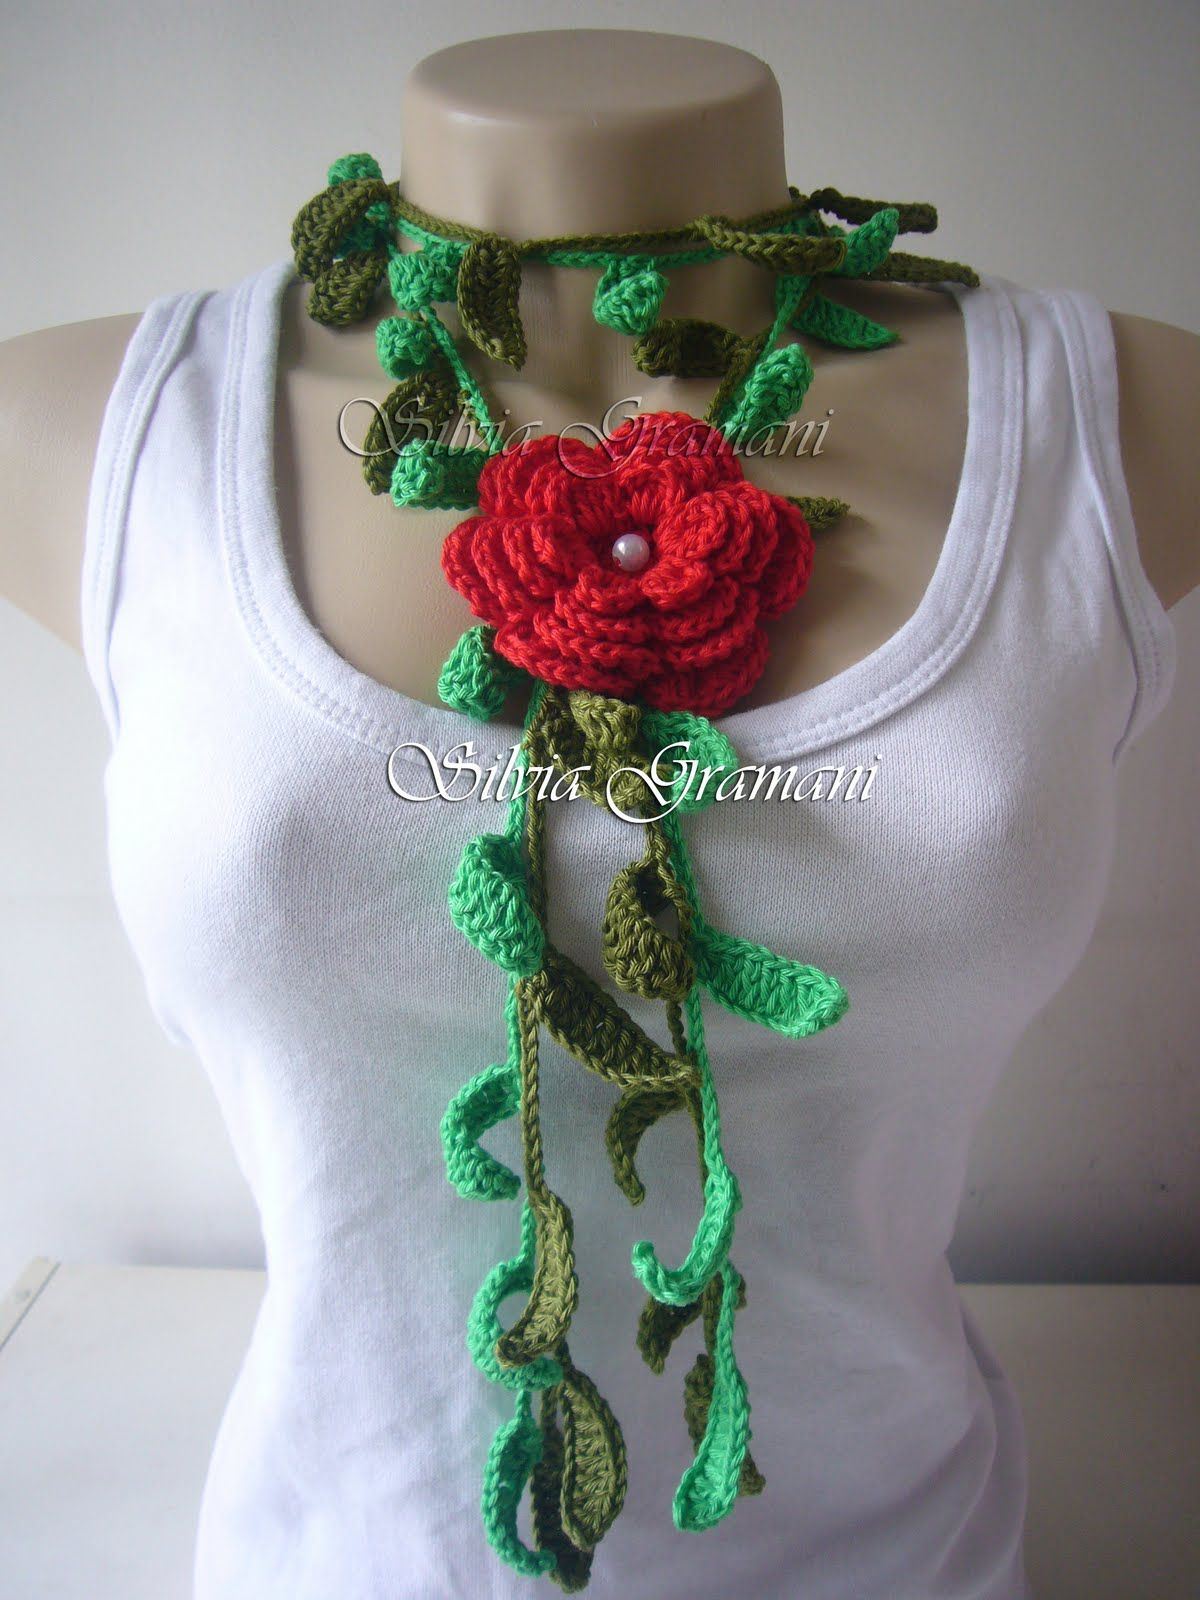 Silvia Gramani Crochê: Cordão de Croche Relva